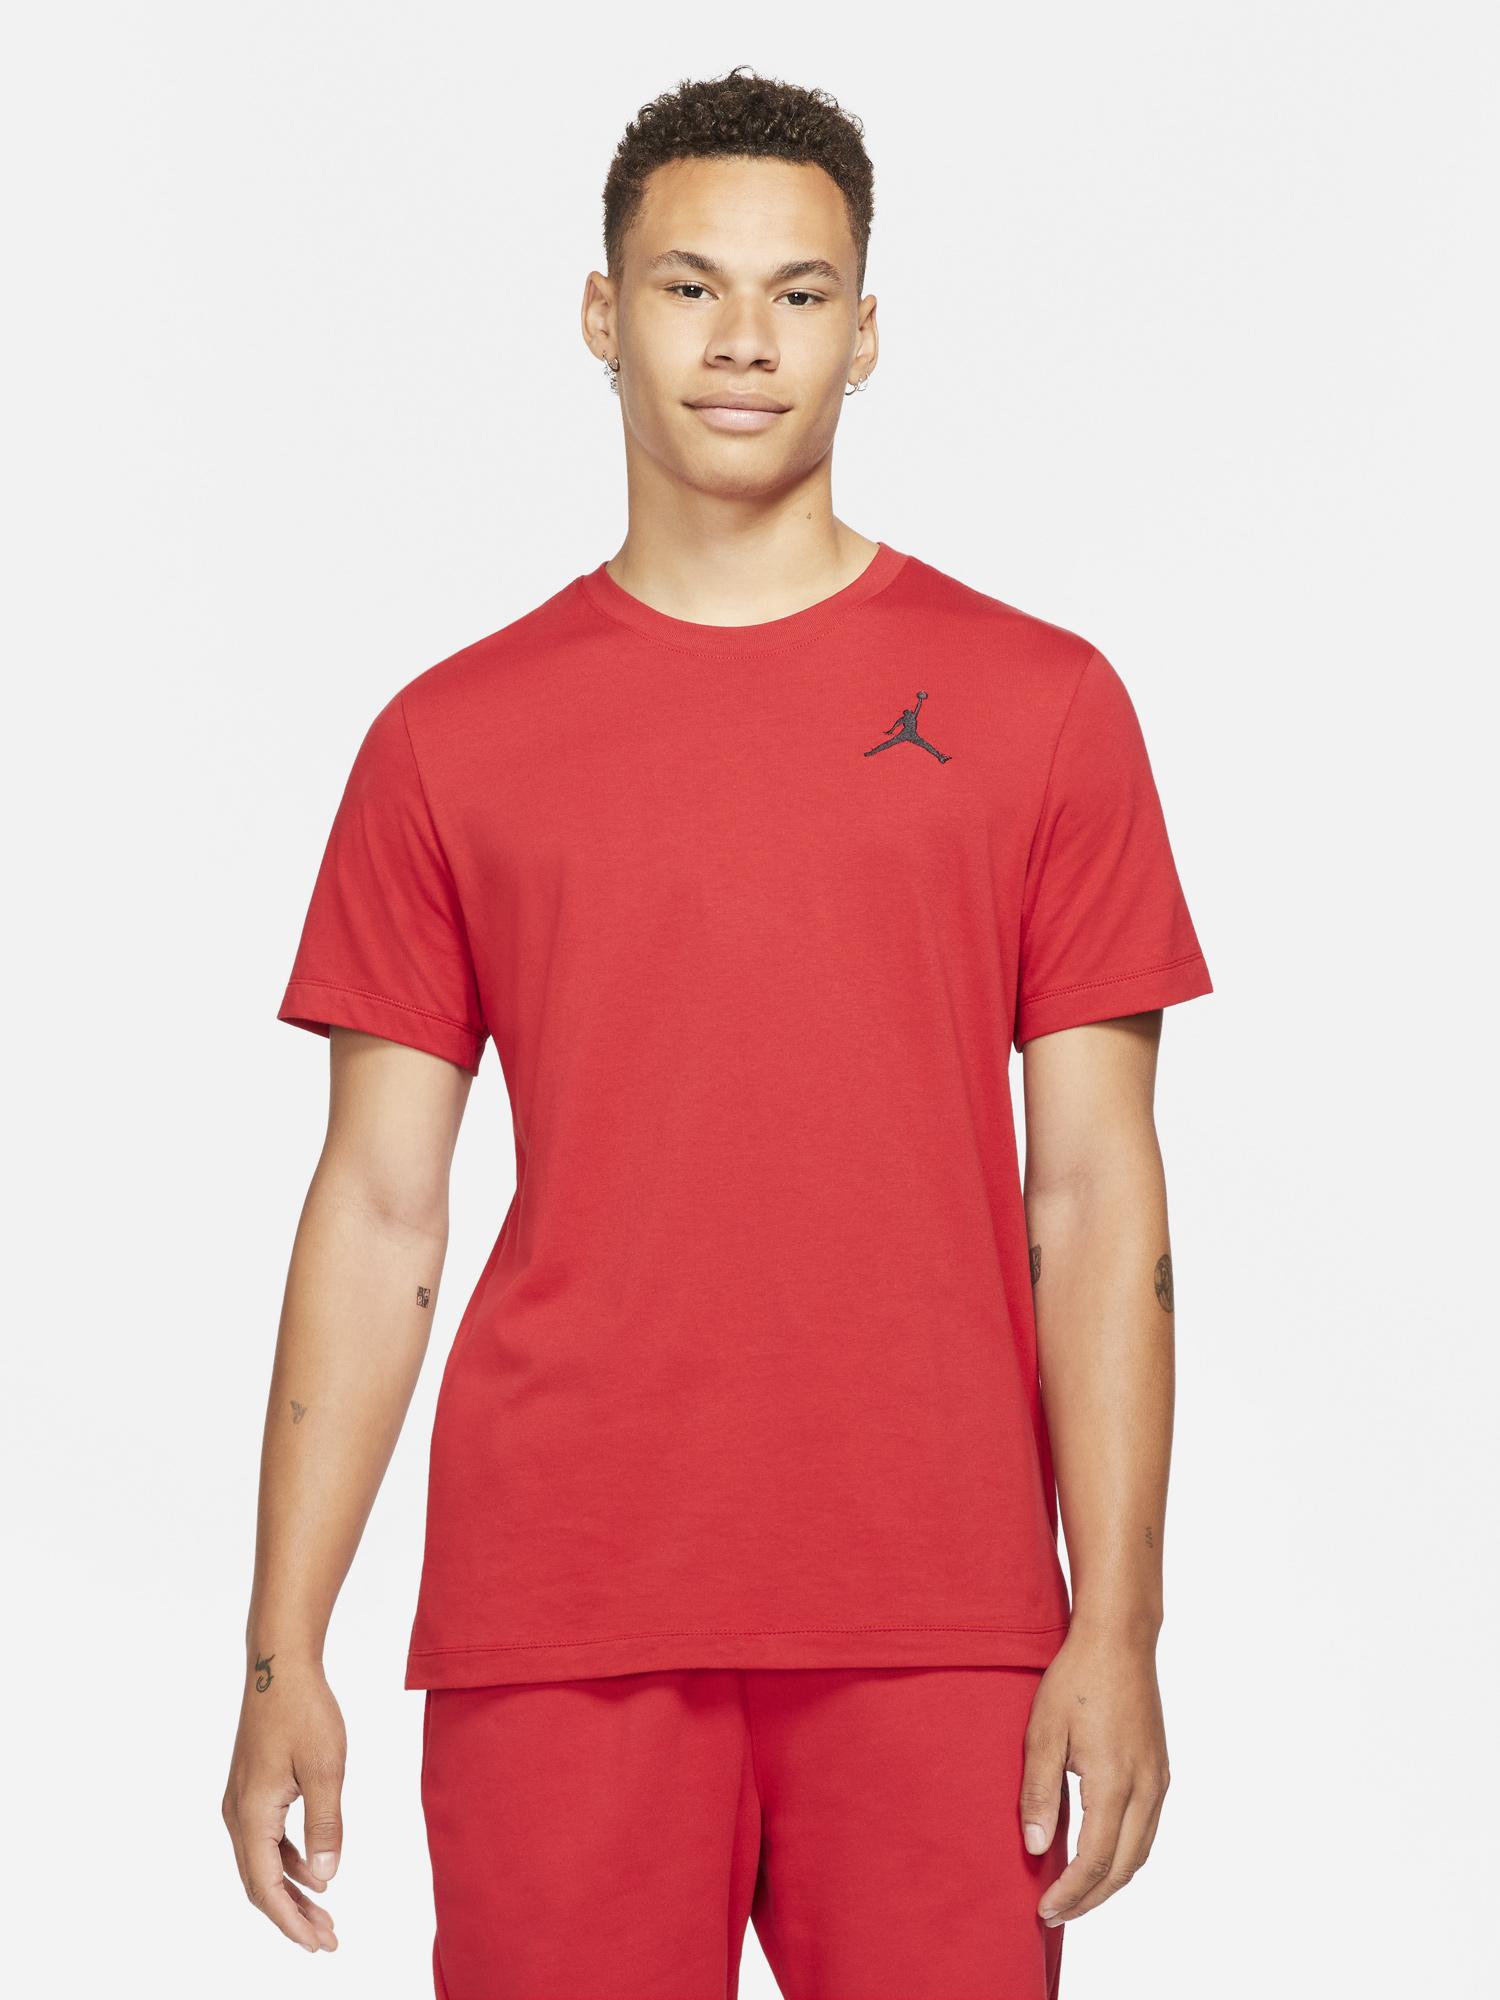 jordan-gym-red-jumpman-embroidered-t-shirt-1